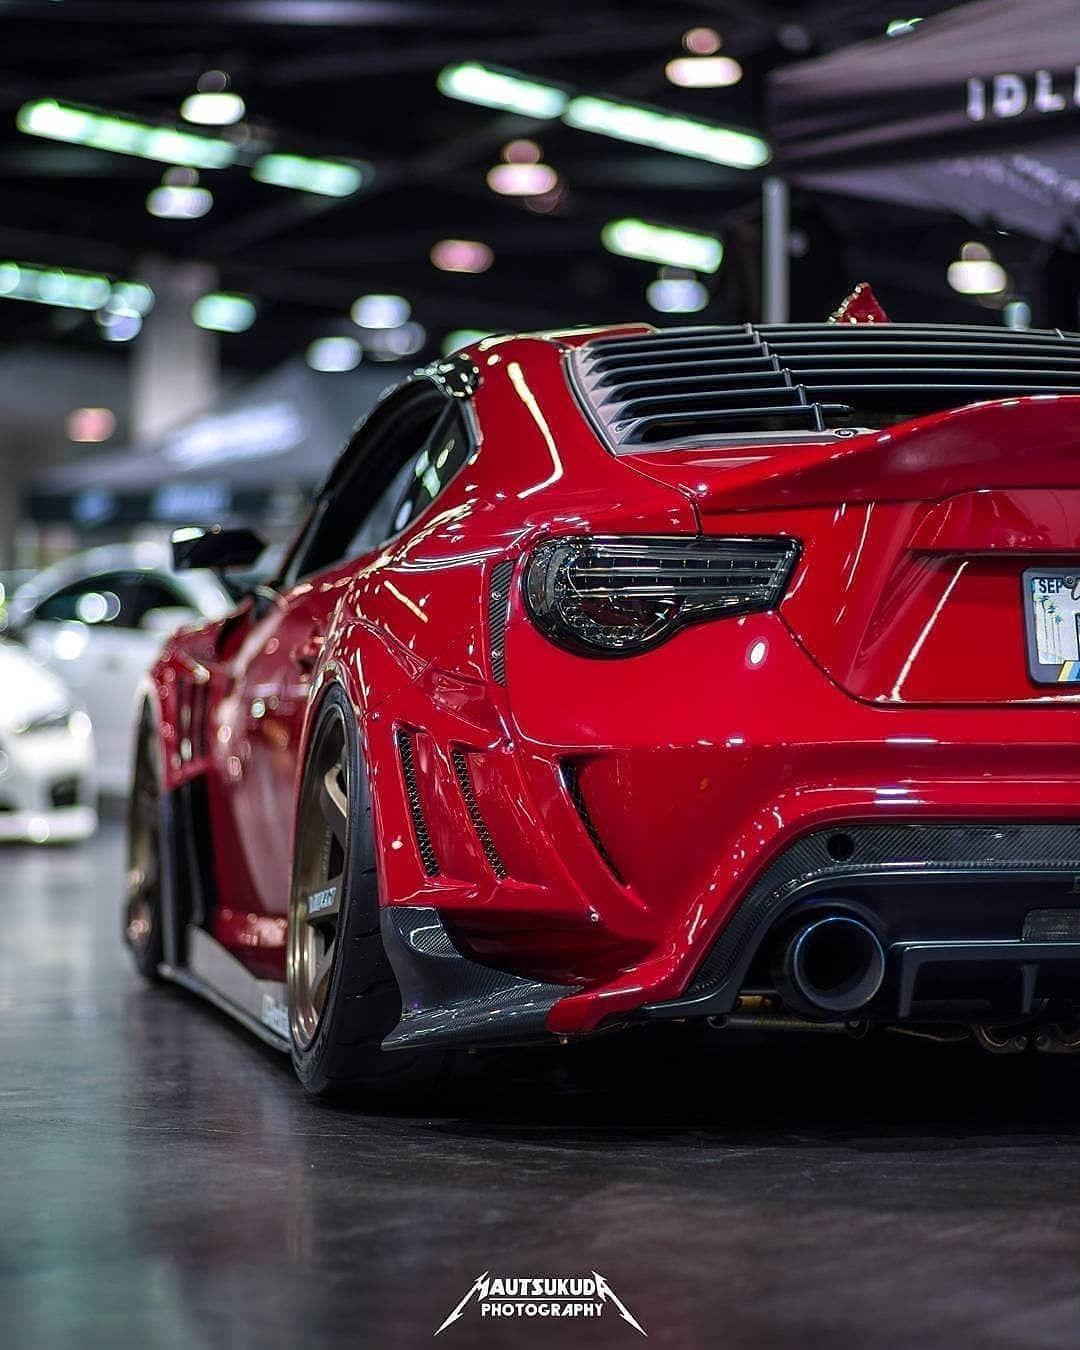 Gambar Mungkin Berisi Mobil Tuner Cars Scion Cars Sports Cars Luxury